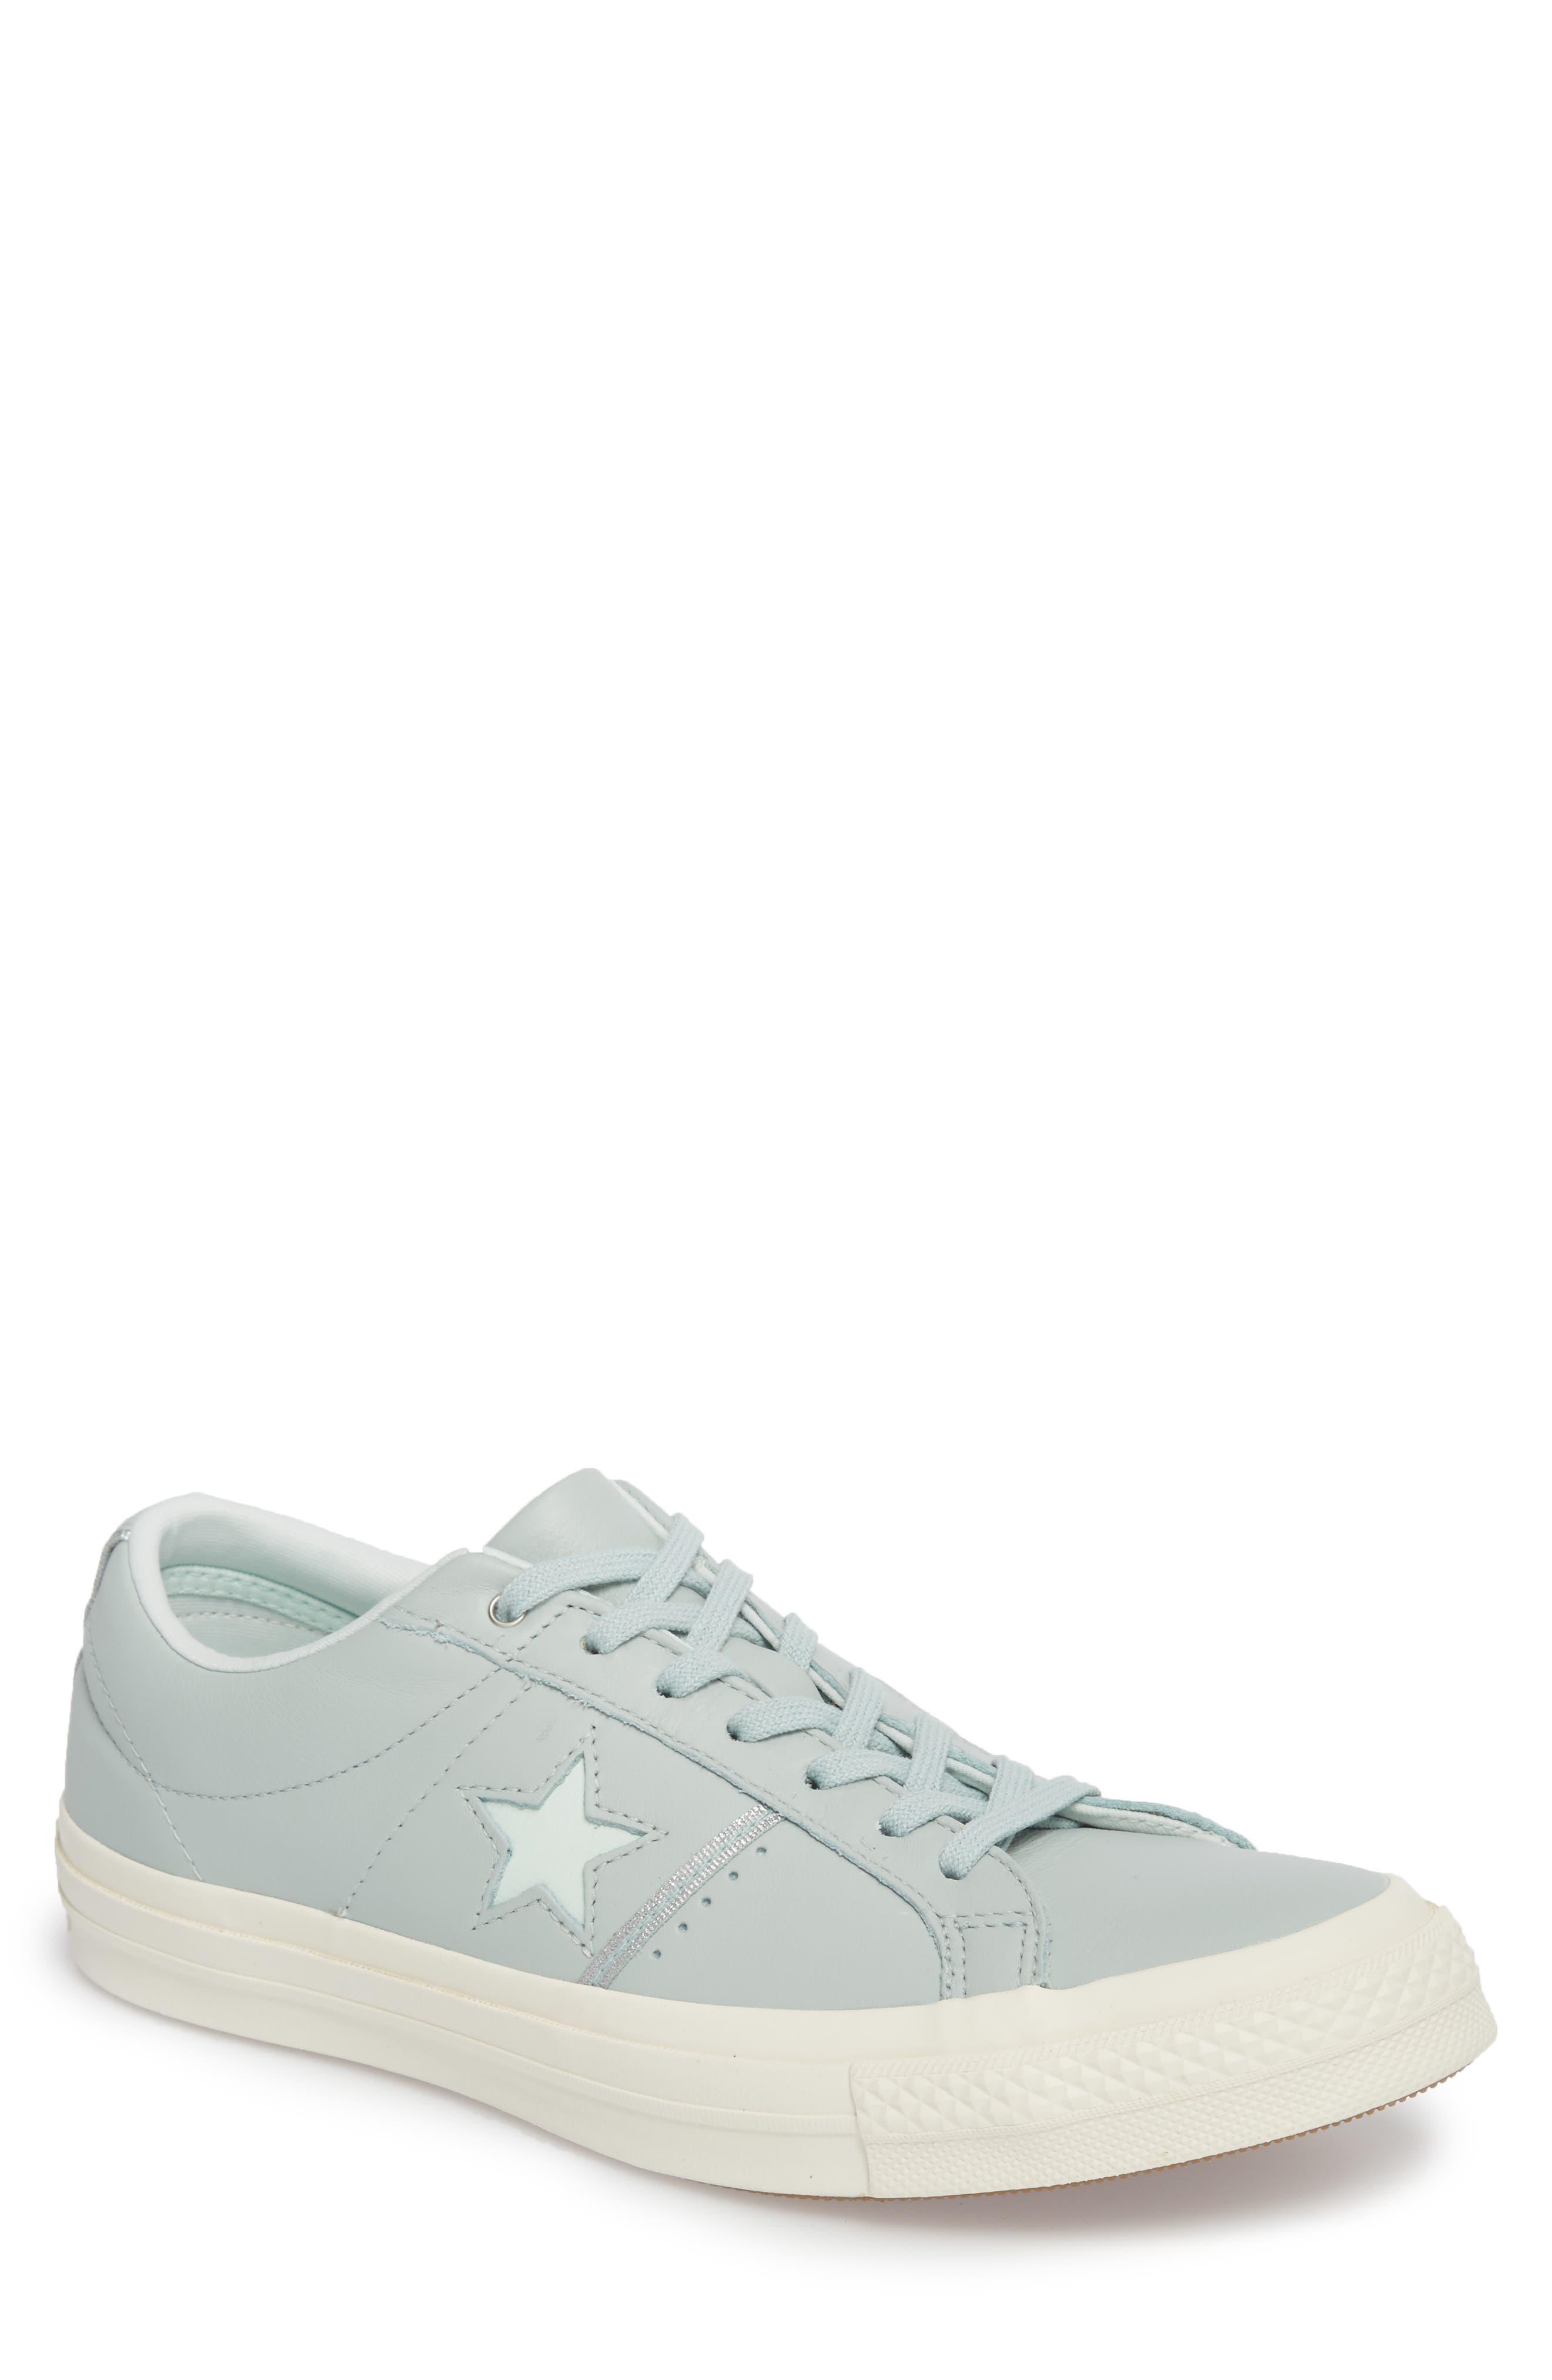 Main Image - Converse Chuck Taylor® One Star Piping Sneaker (Men)